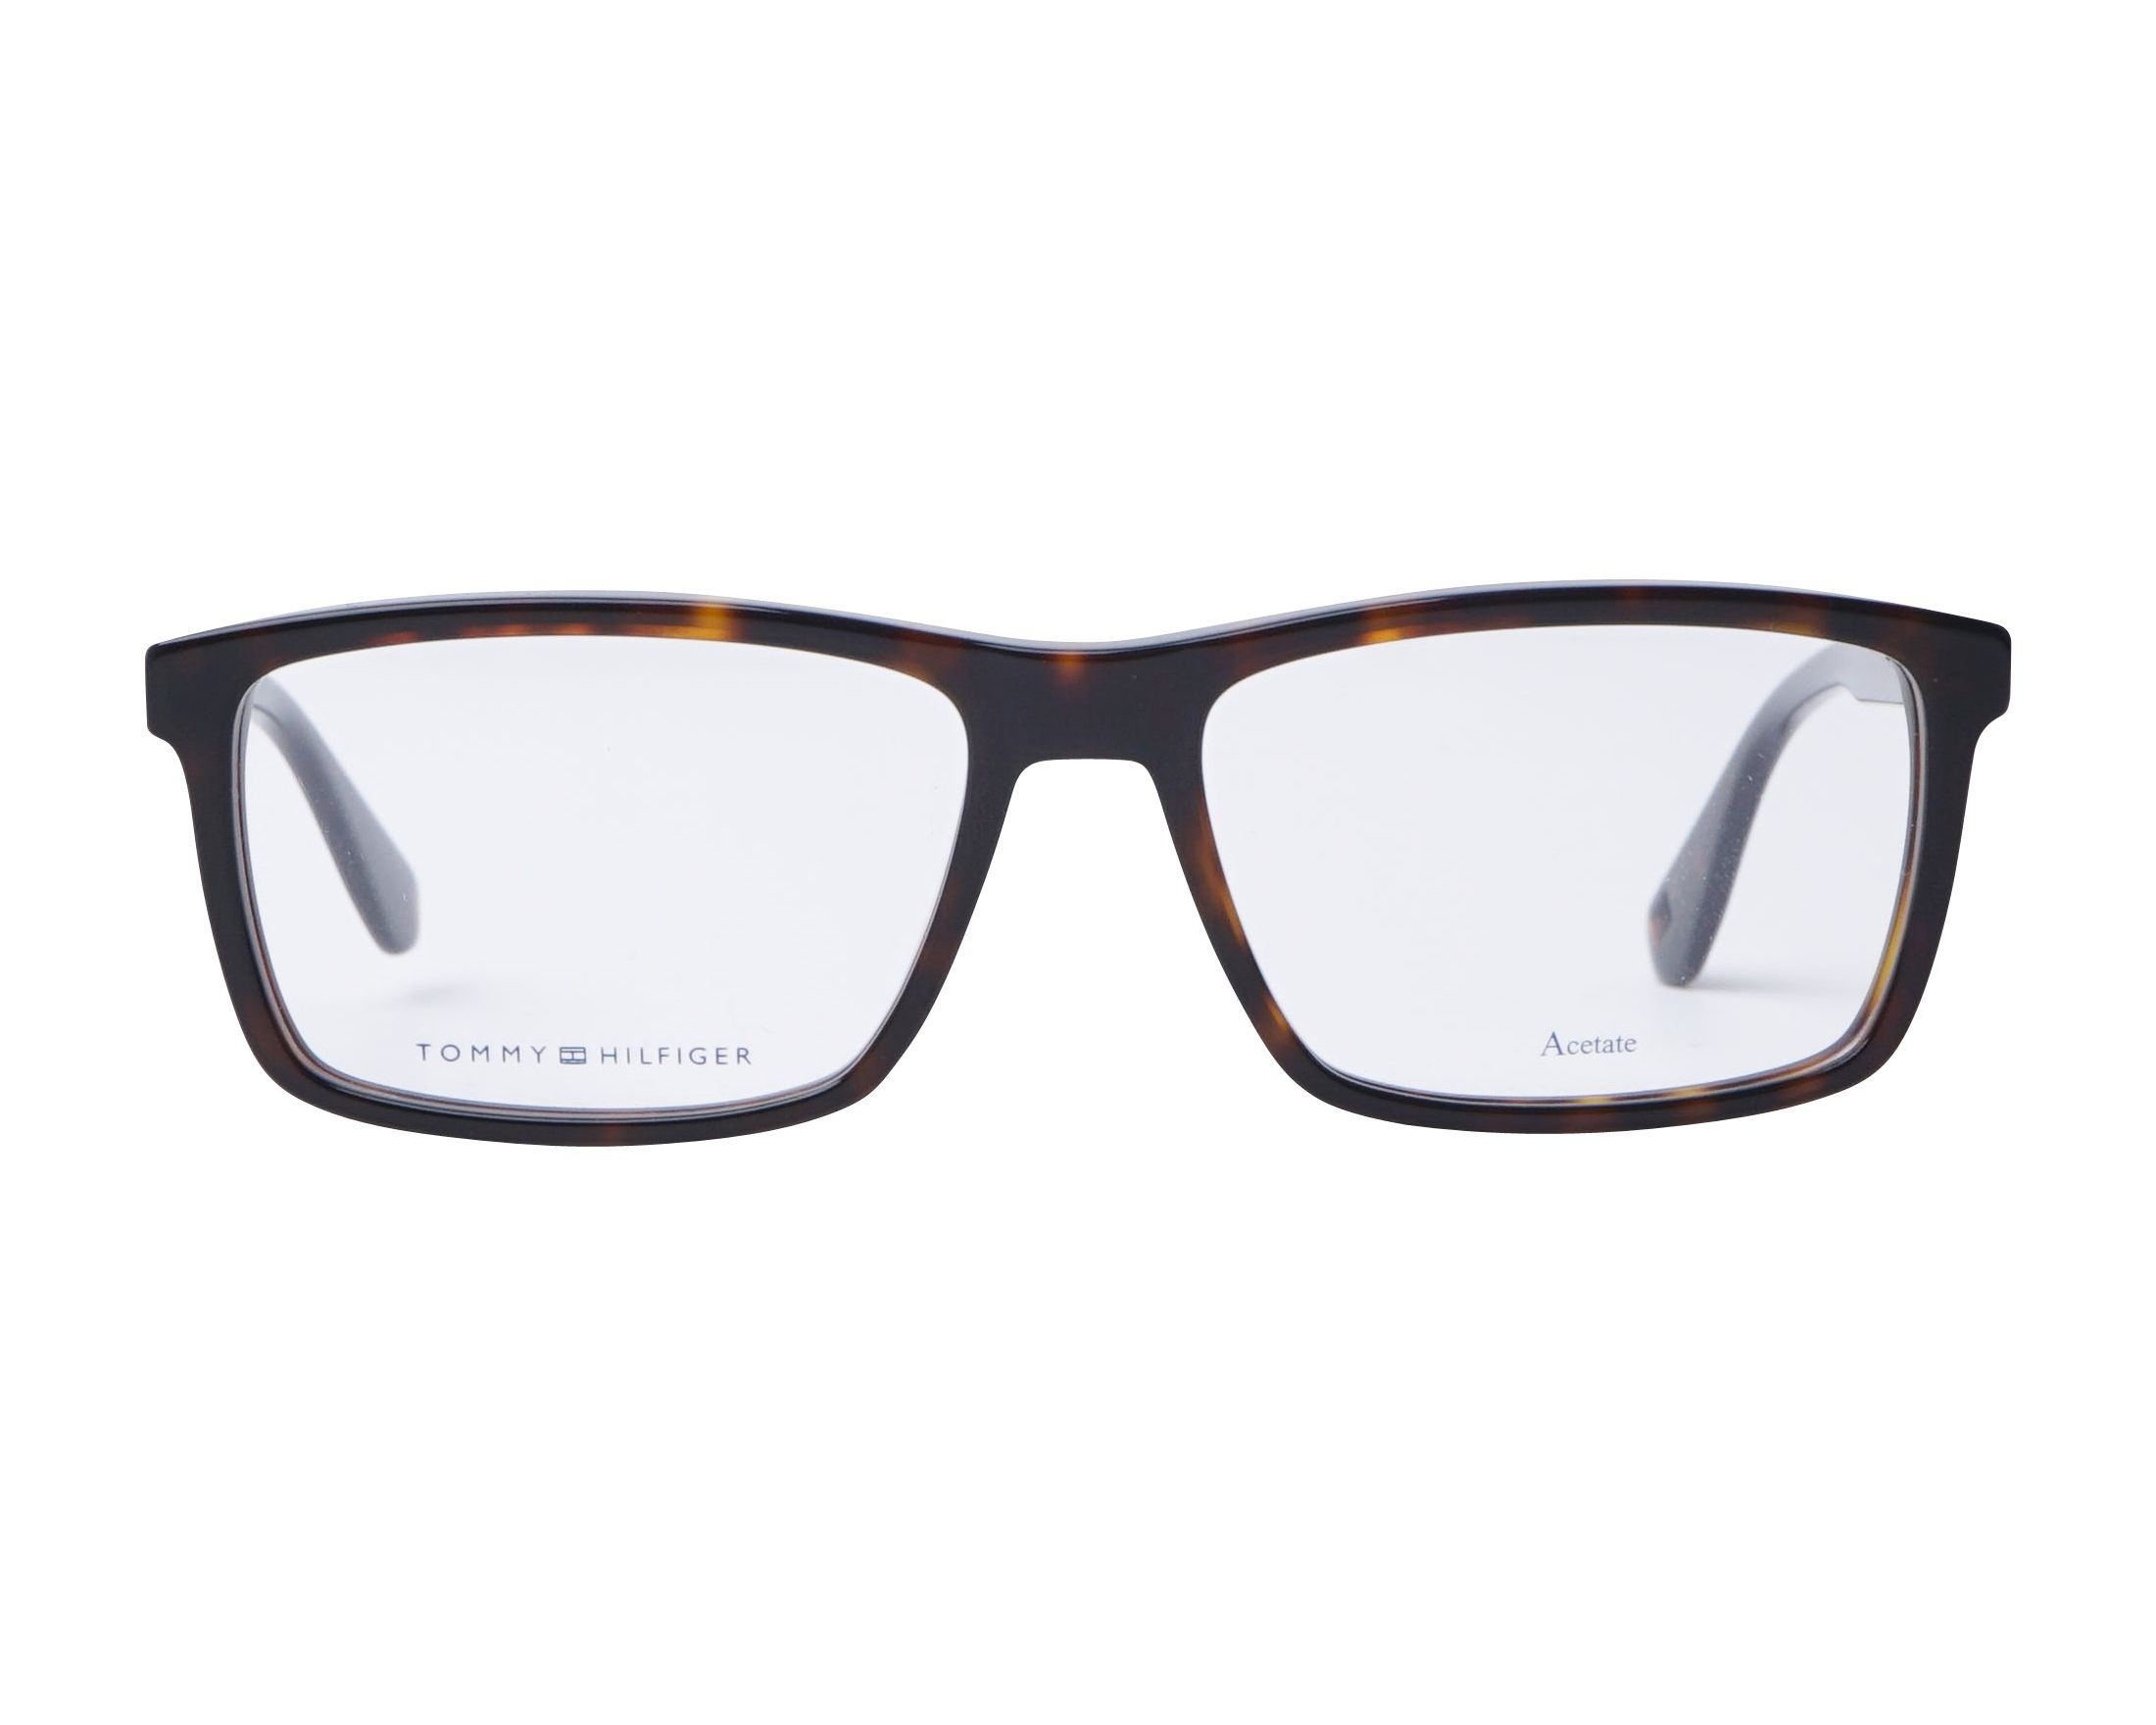 e71ec8af2151a Gafas Graduadas Tommy Hilfiger TH-1549 086 55-16 Havana vista de frente